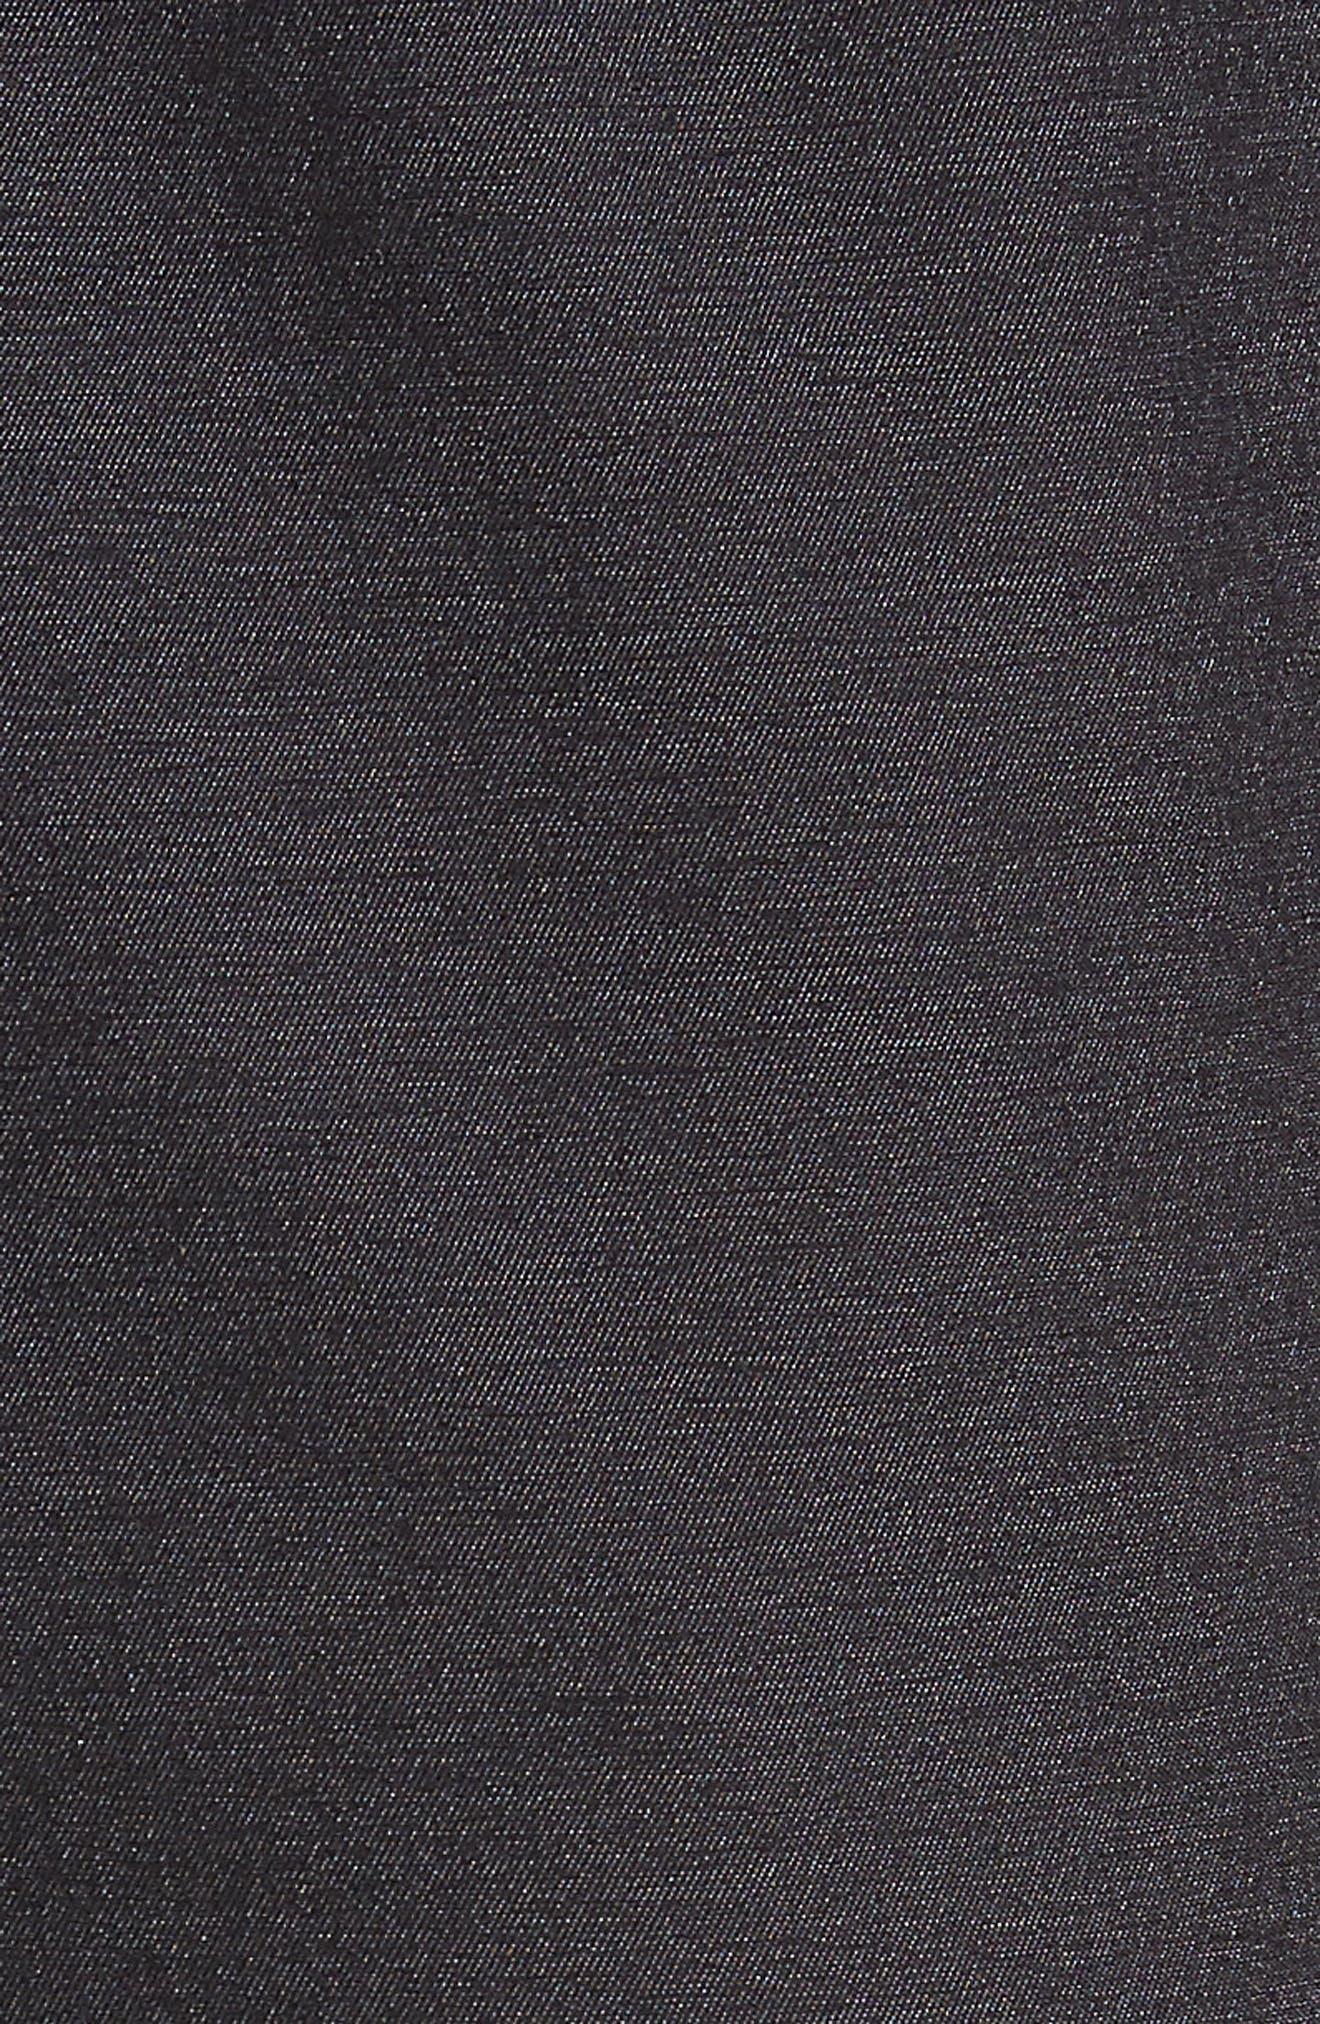 Relay Lounge Pants,                             Alternate thumbnail 5, color,                             Heather Black